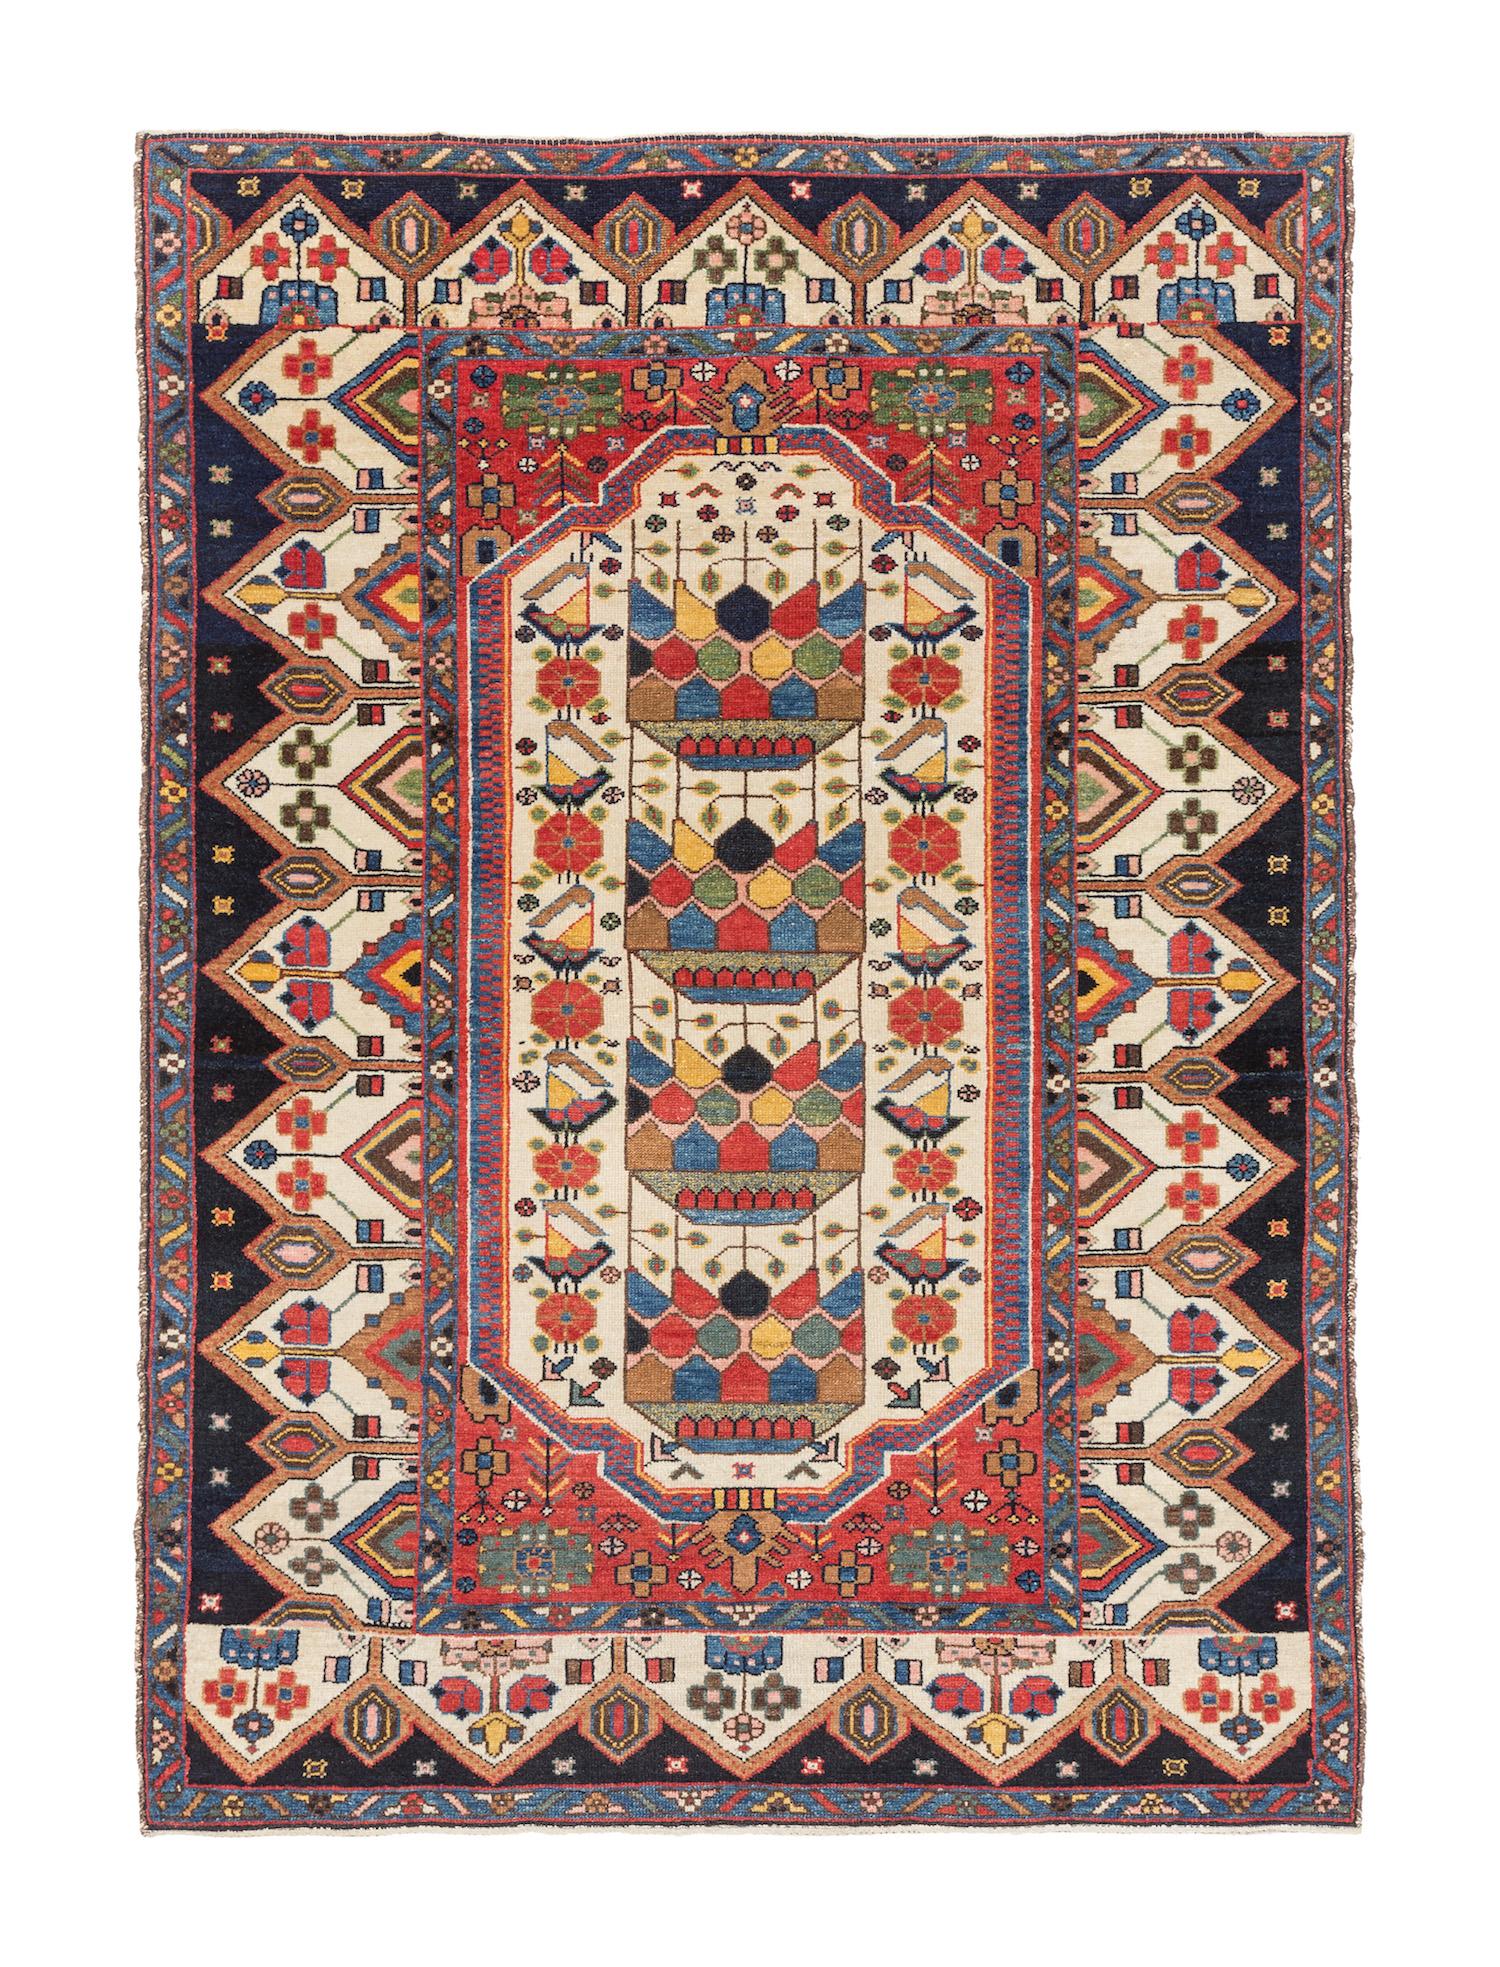 Saveh-Zarand rug